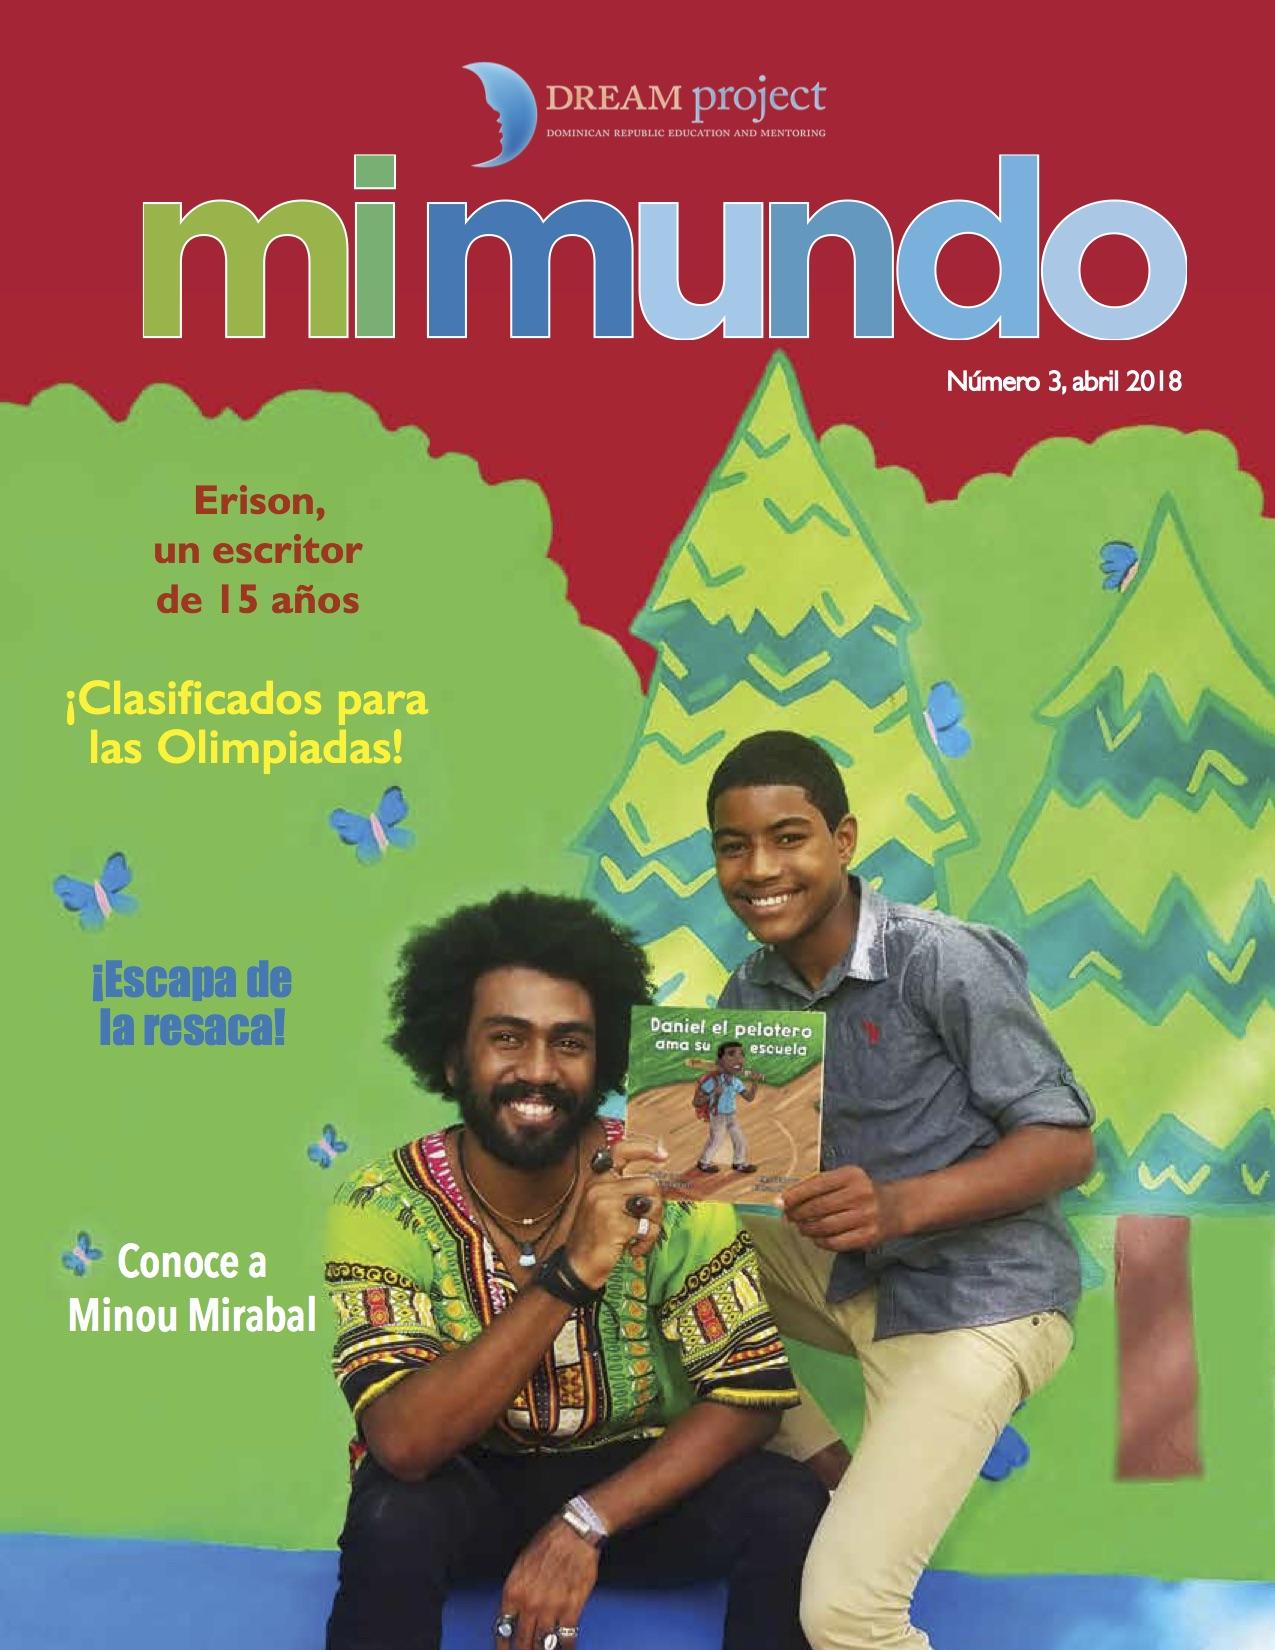 MI MUNDO 3 LOW RES FINAL (dragged).jpg